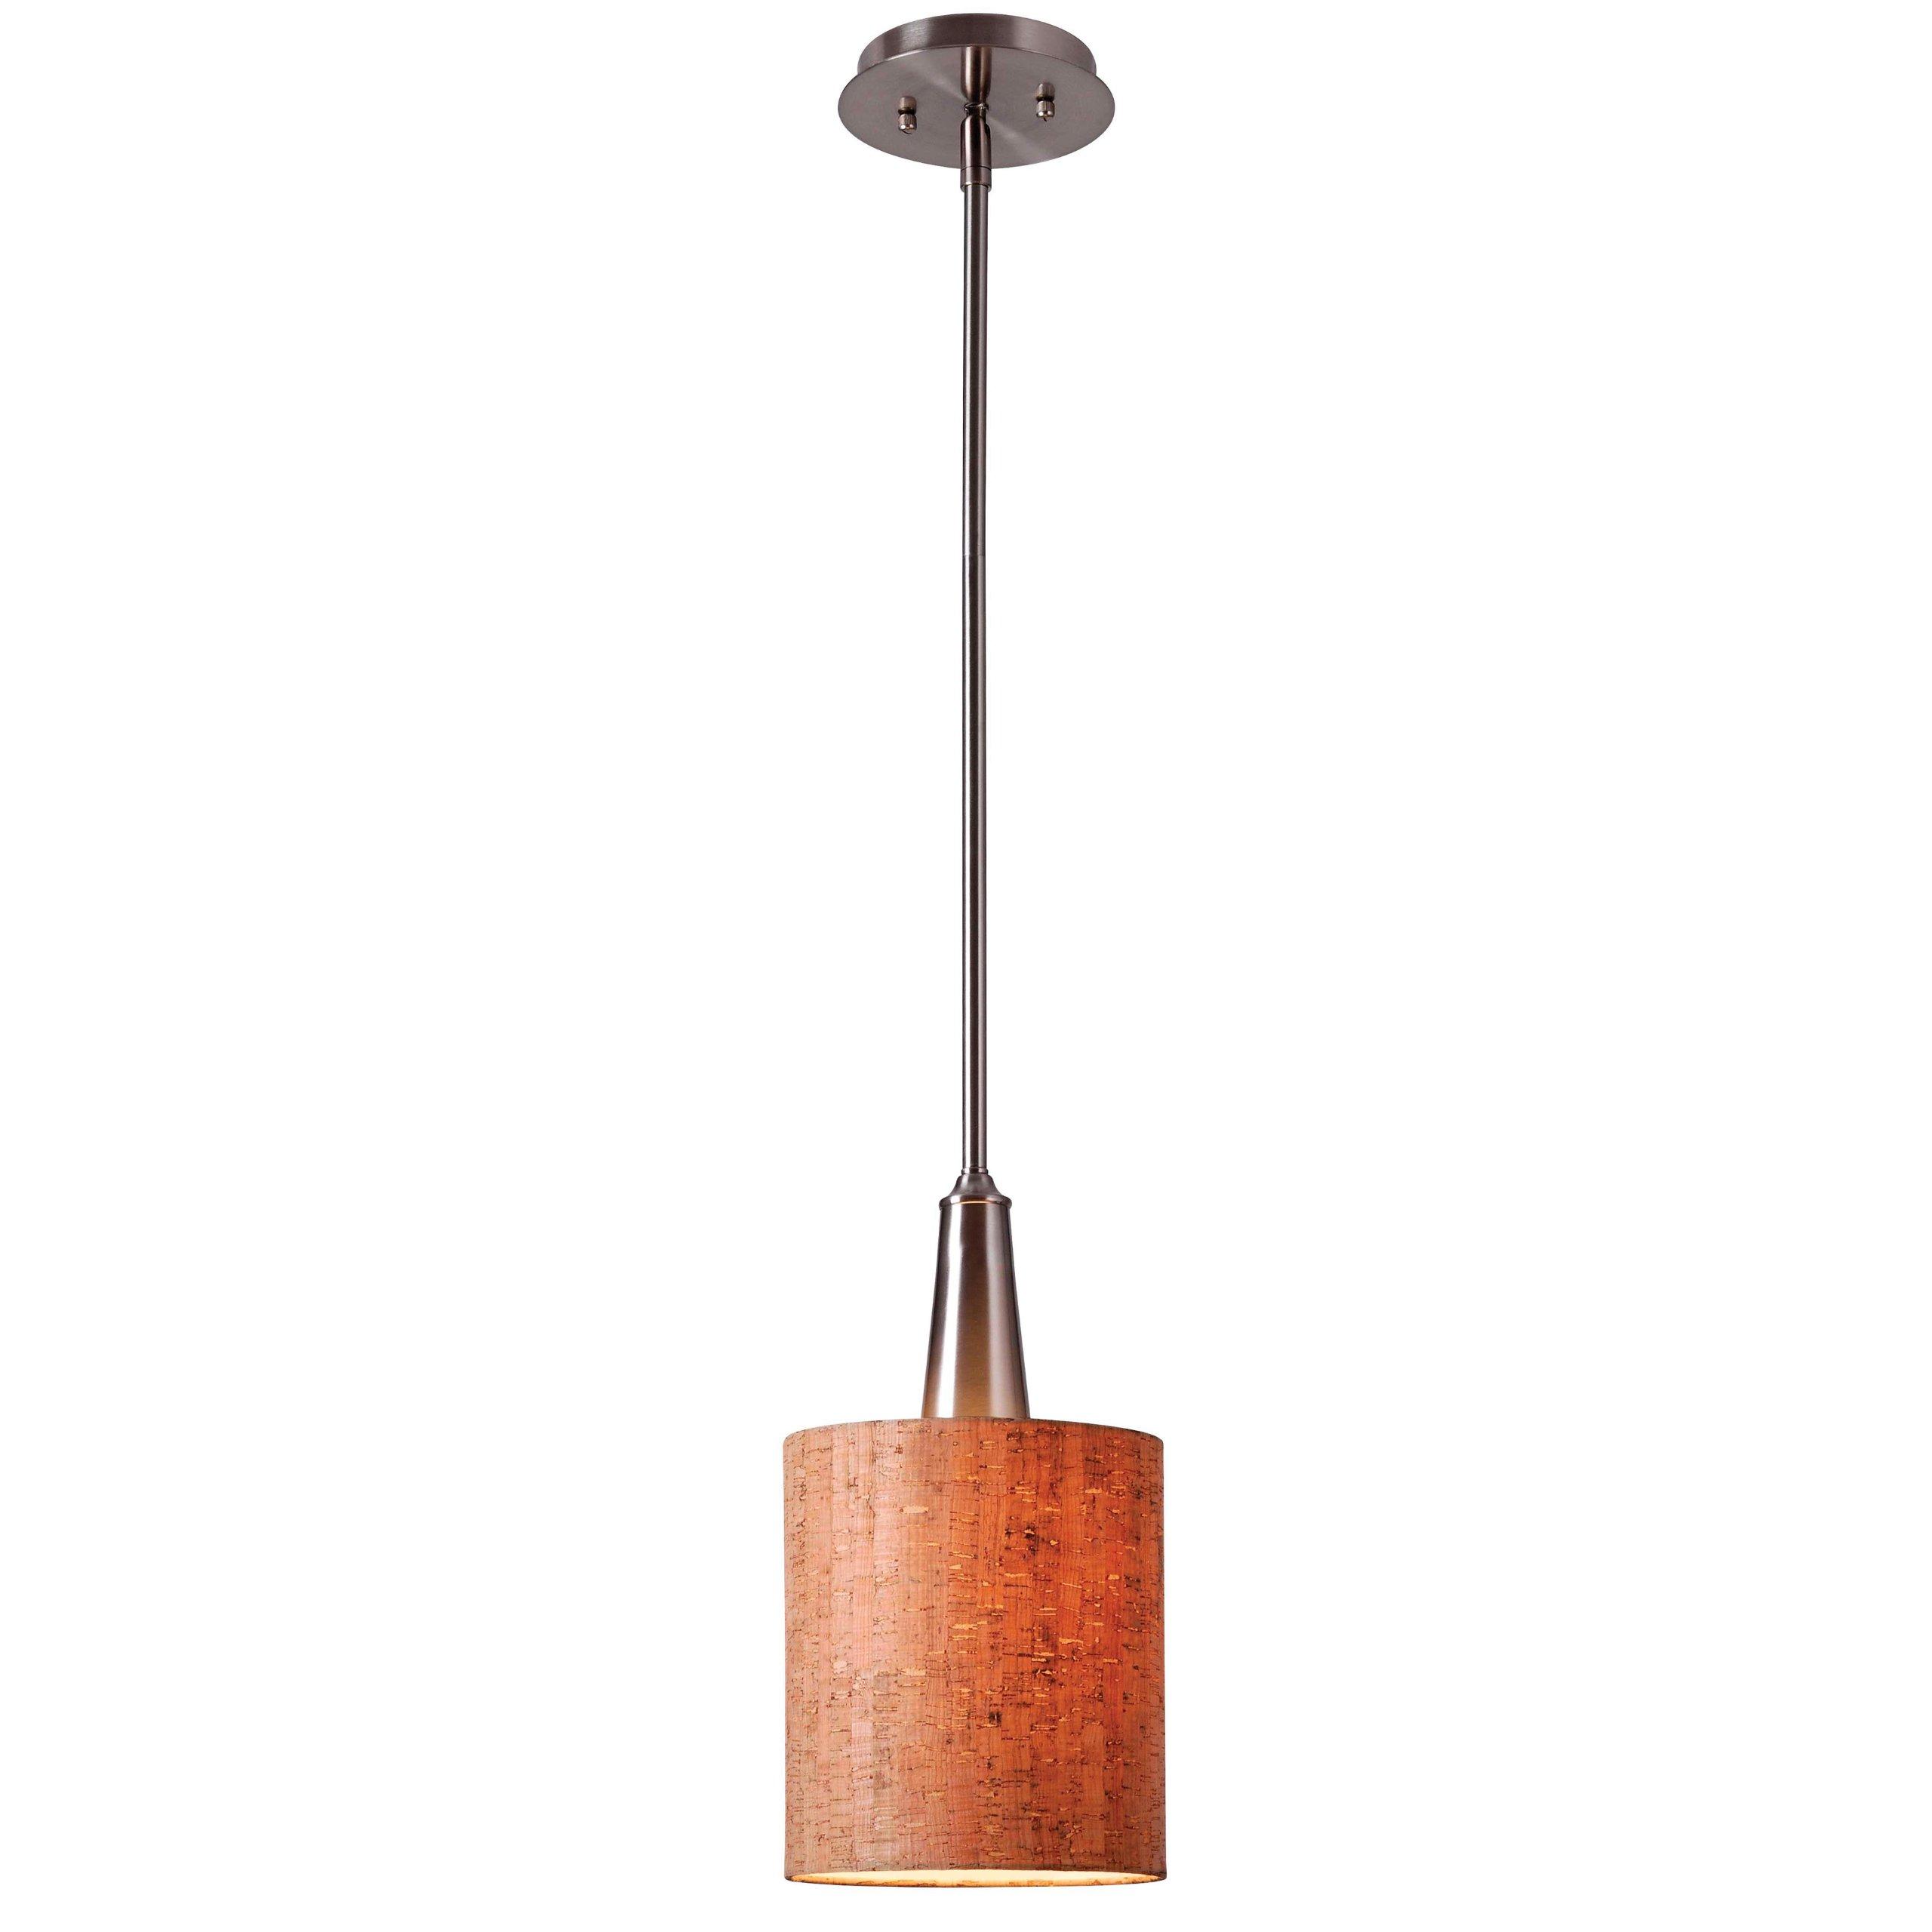 Kenroy Home 93011BS Bulletin 1-Light Mini Pendant, Brushed Steel